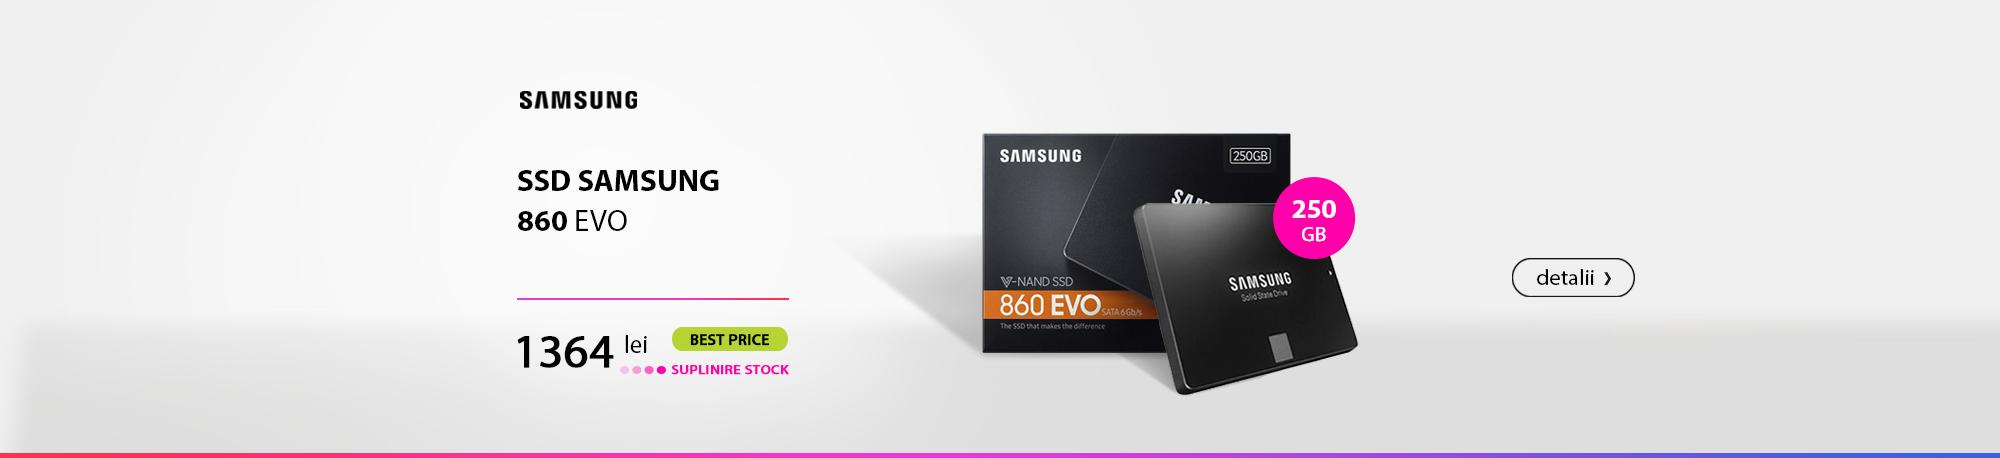 SSD 250GB Samsung 860 EVO.jpg